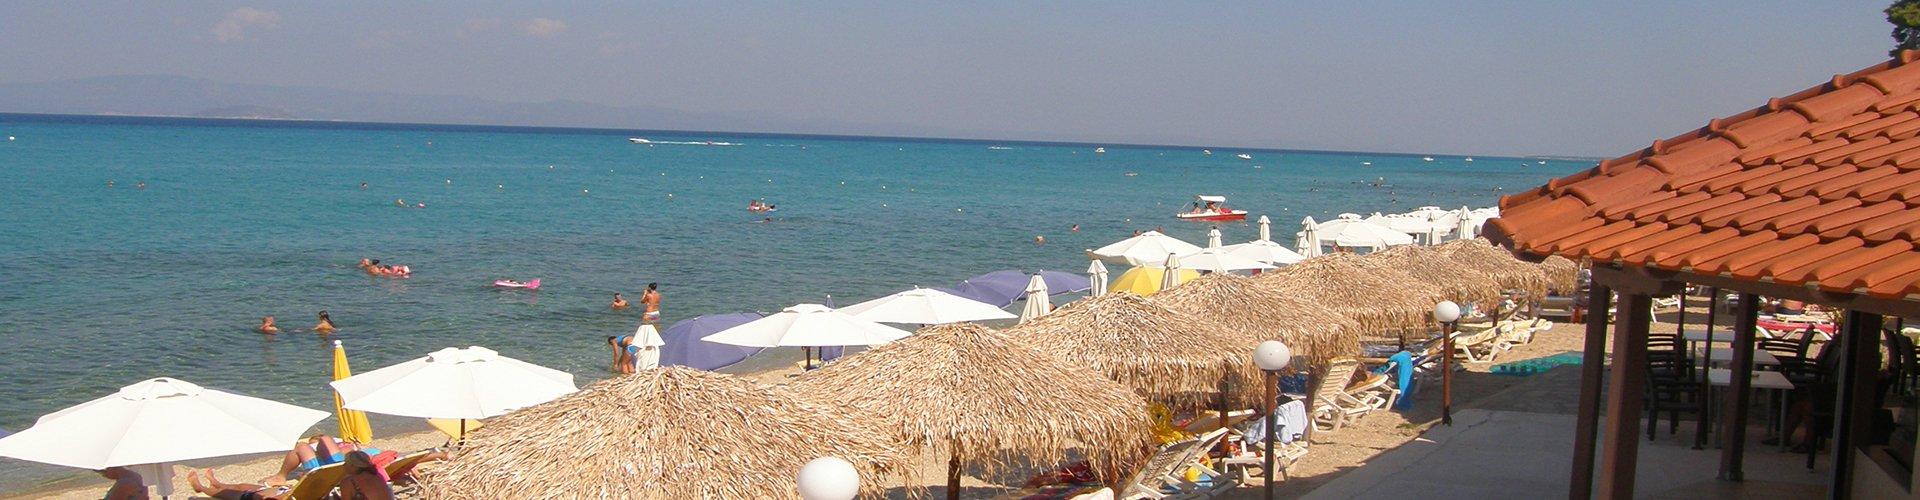 Duga peščana plaža u Haniotiju